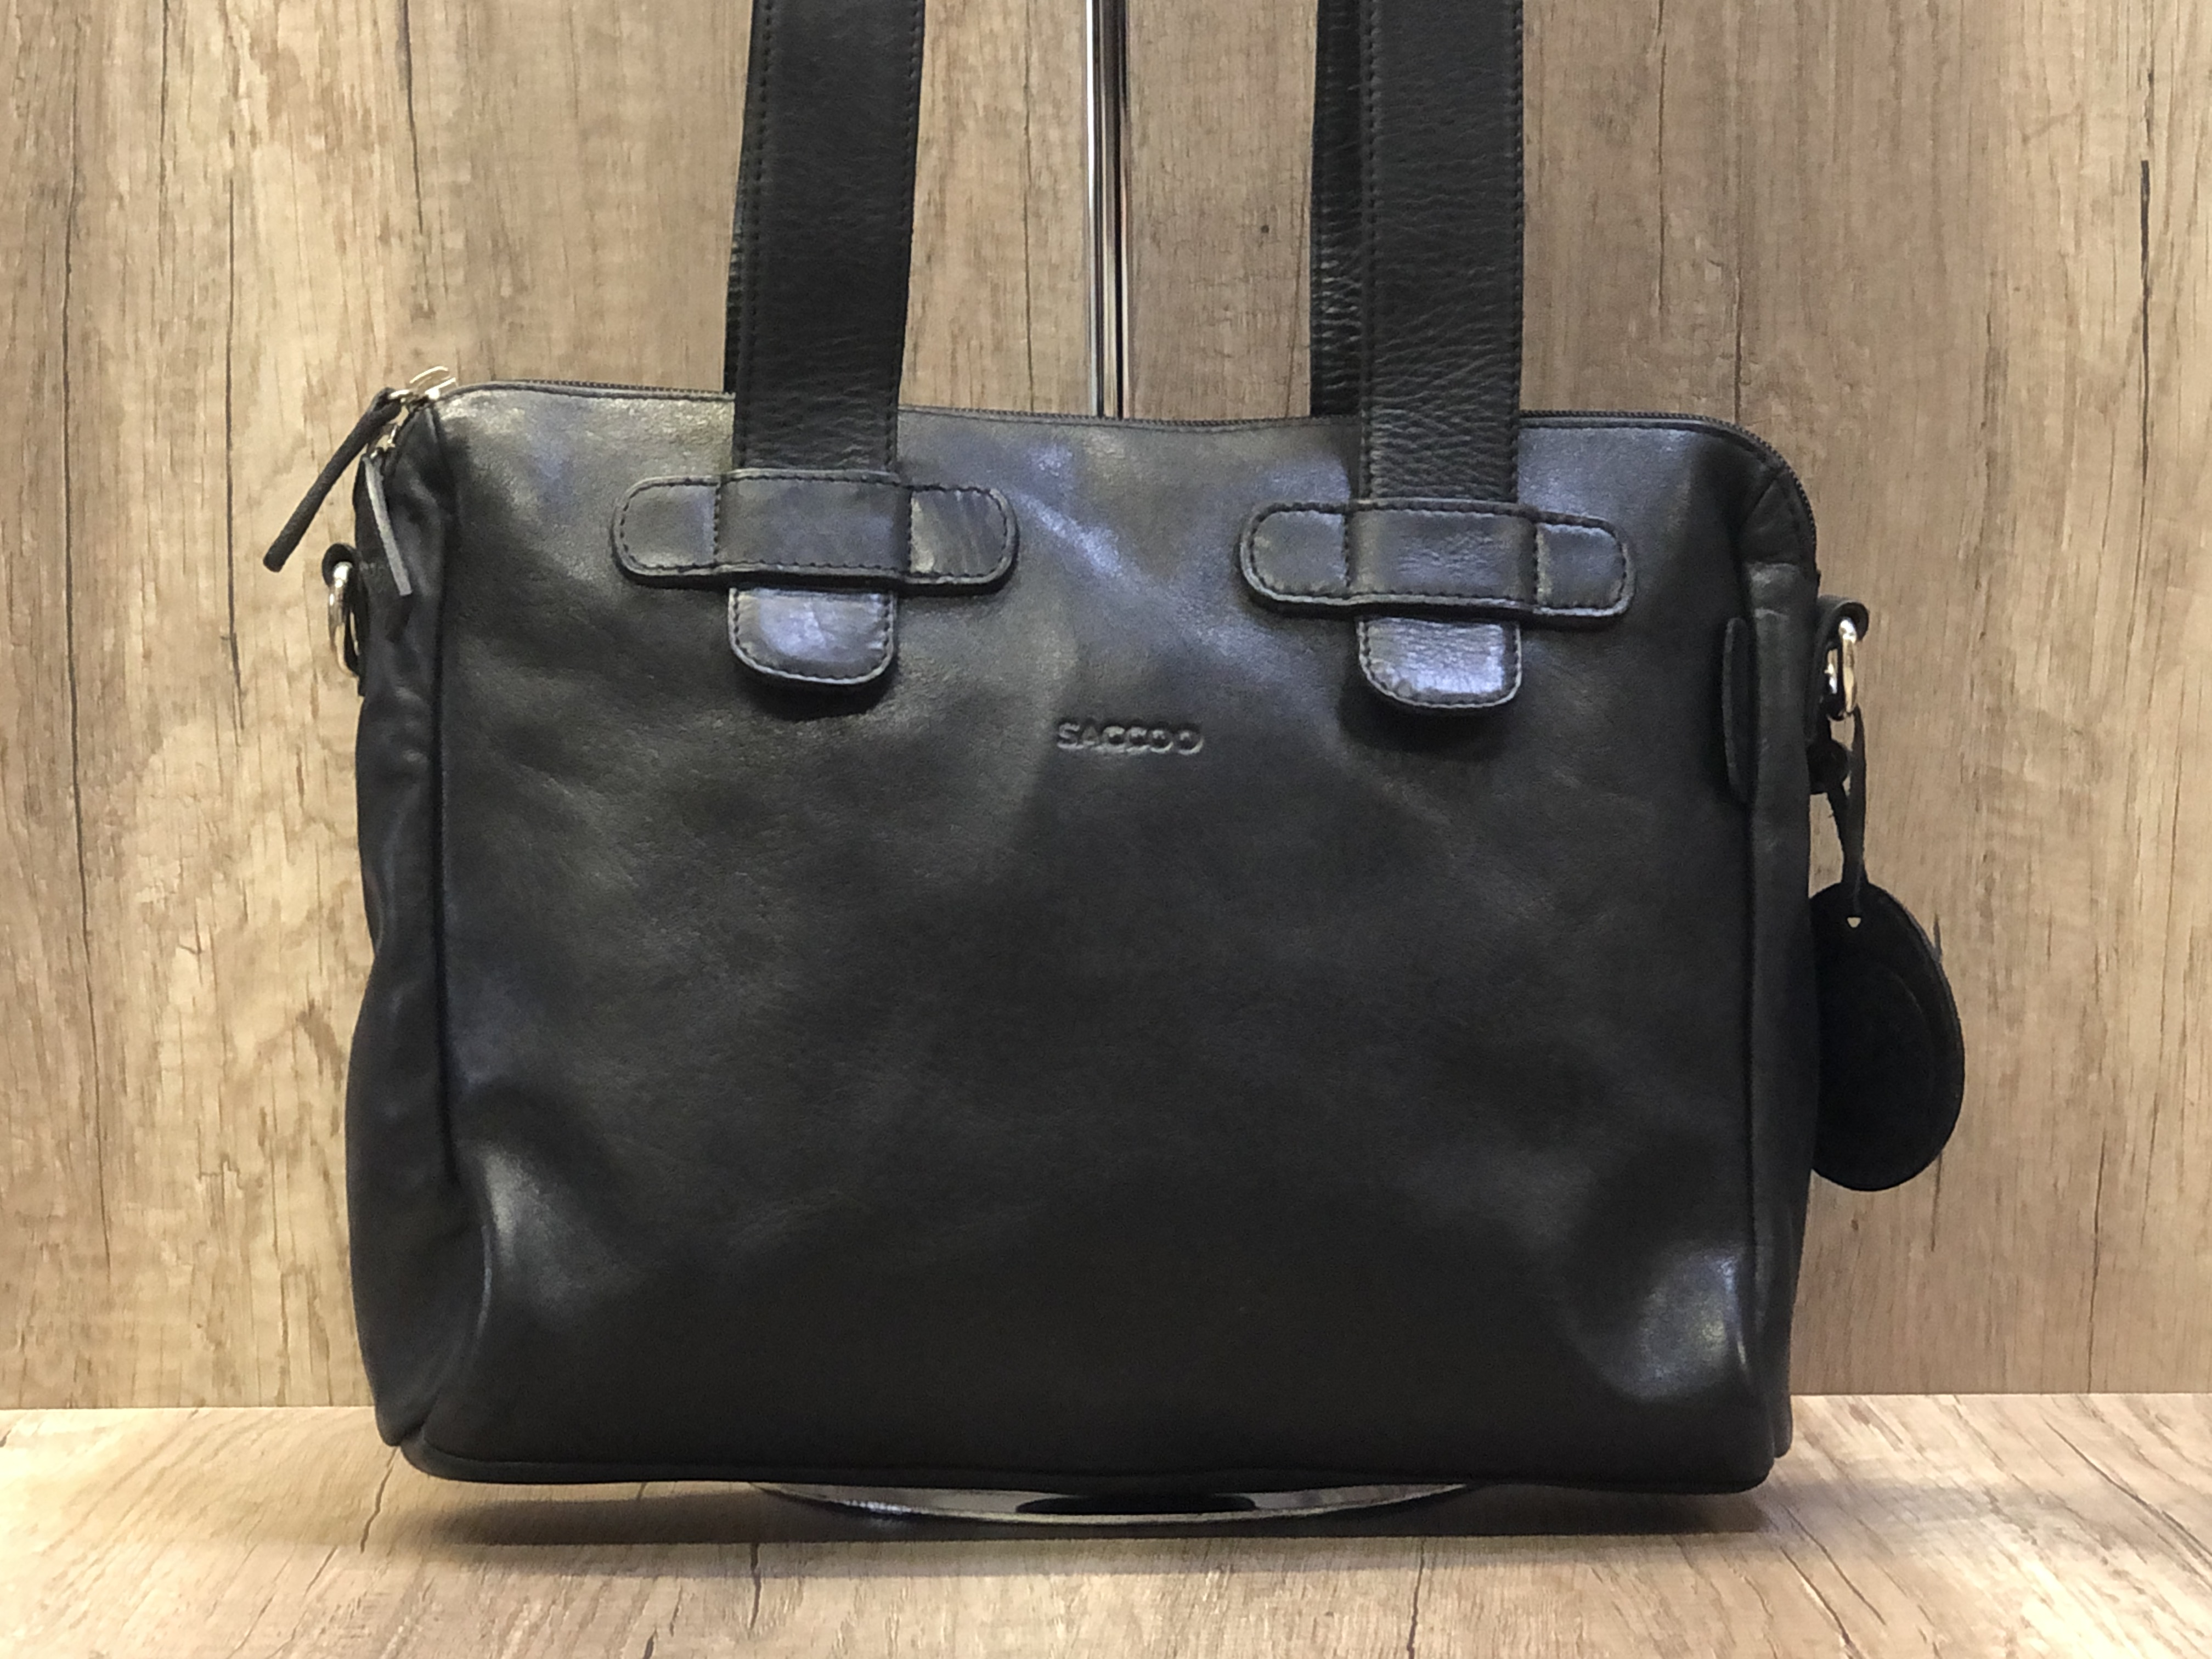 Saccoo-handtassen 16